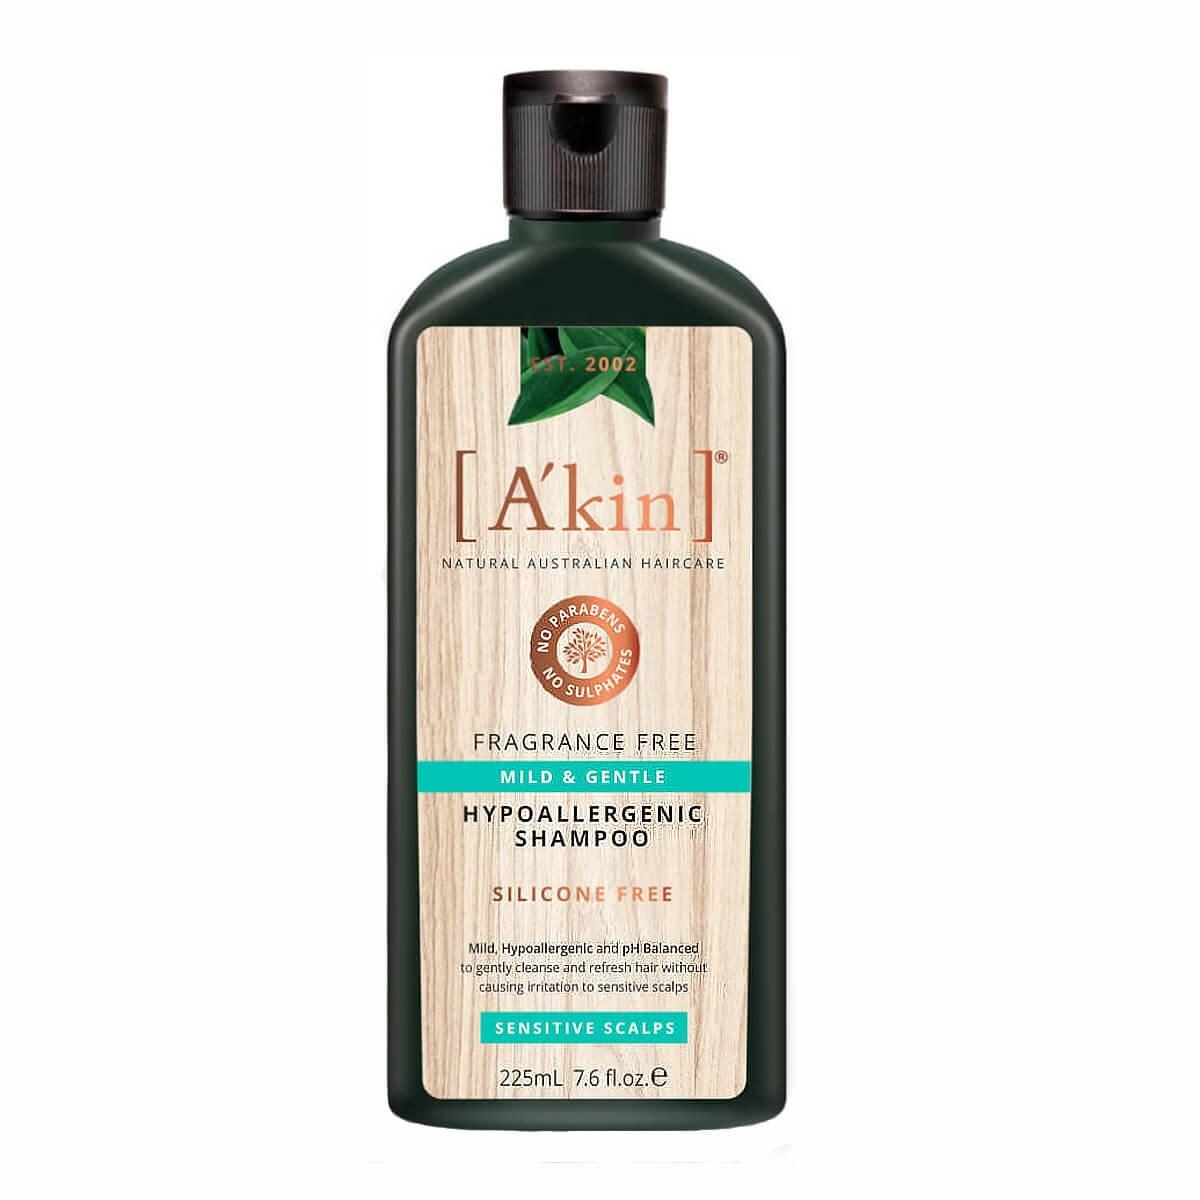 A'kin Mild & Gentle Fragrance Free Shampoo